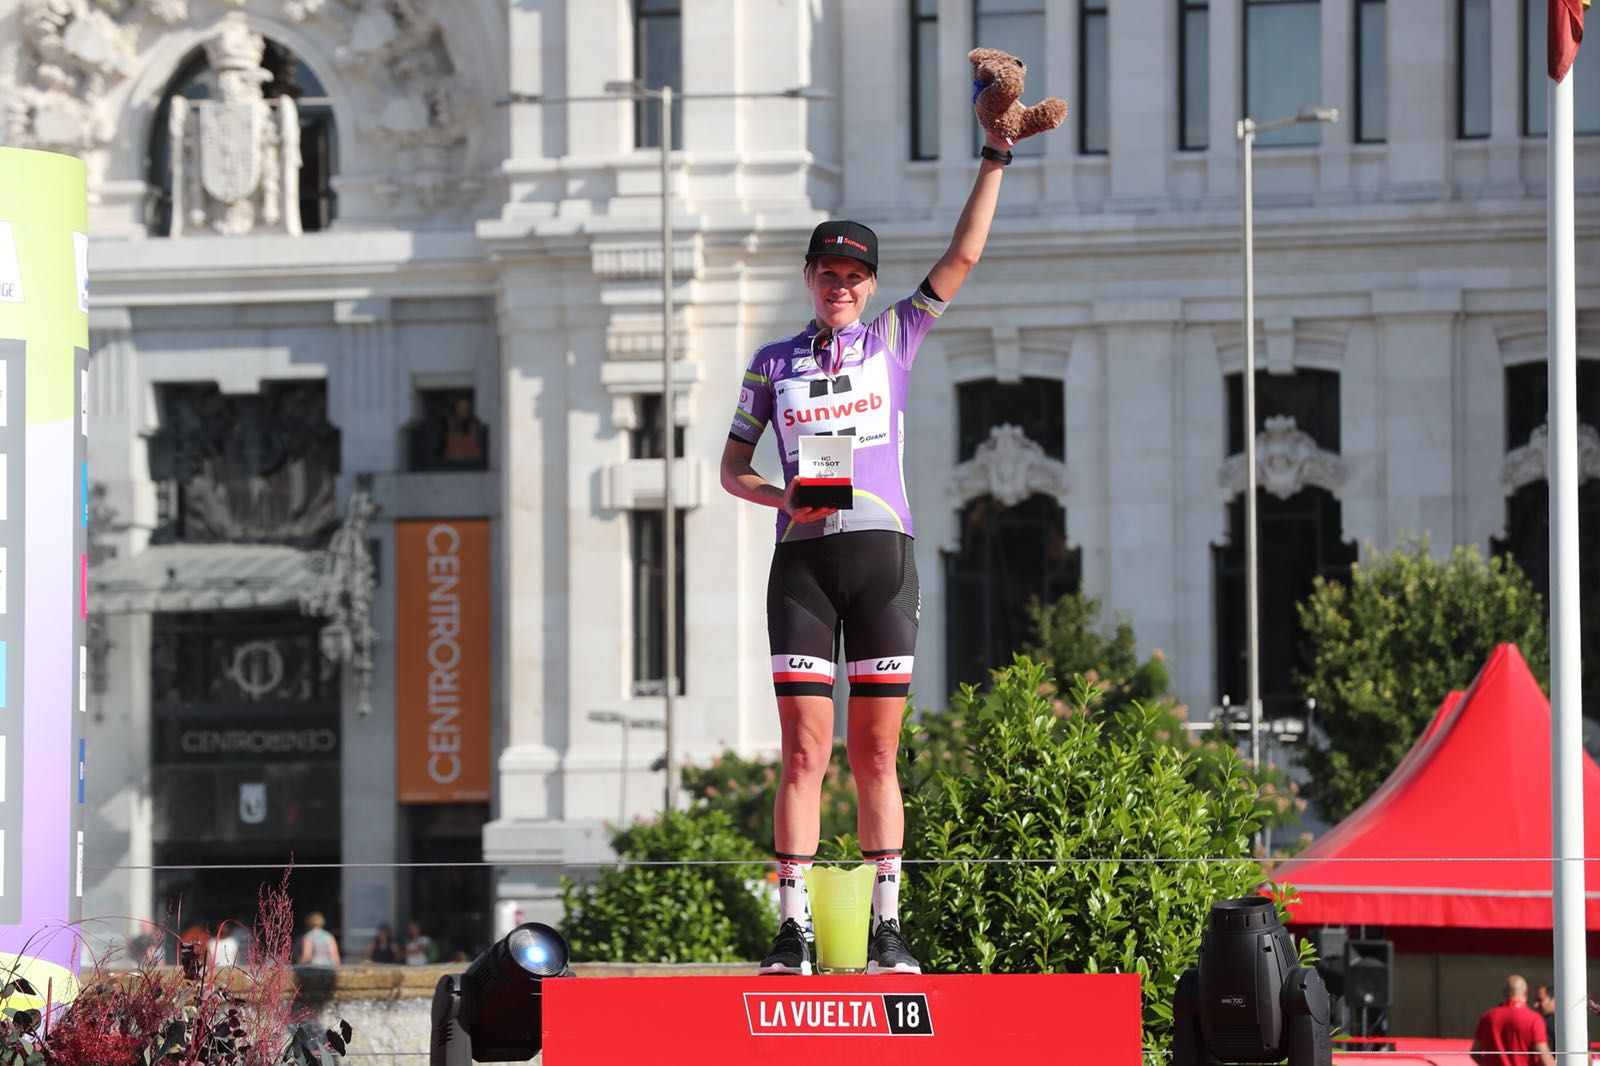 Ellen van Dijk vince la classifica finale della Madrid Challenge by La Vuelta 2018